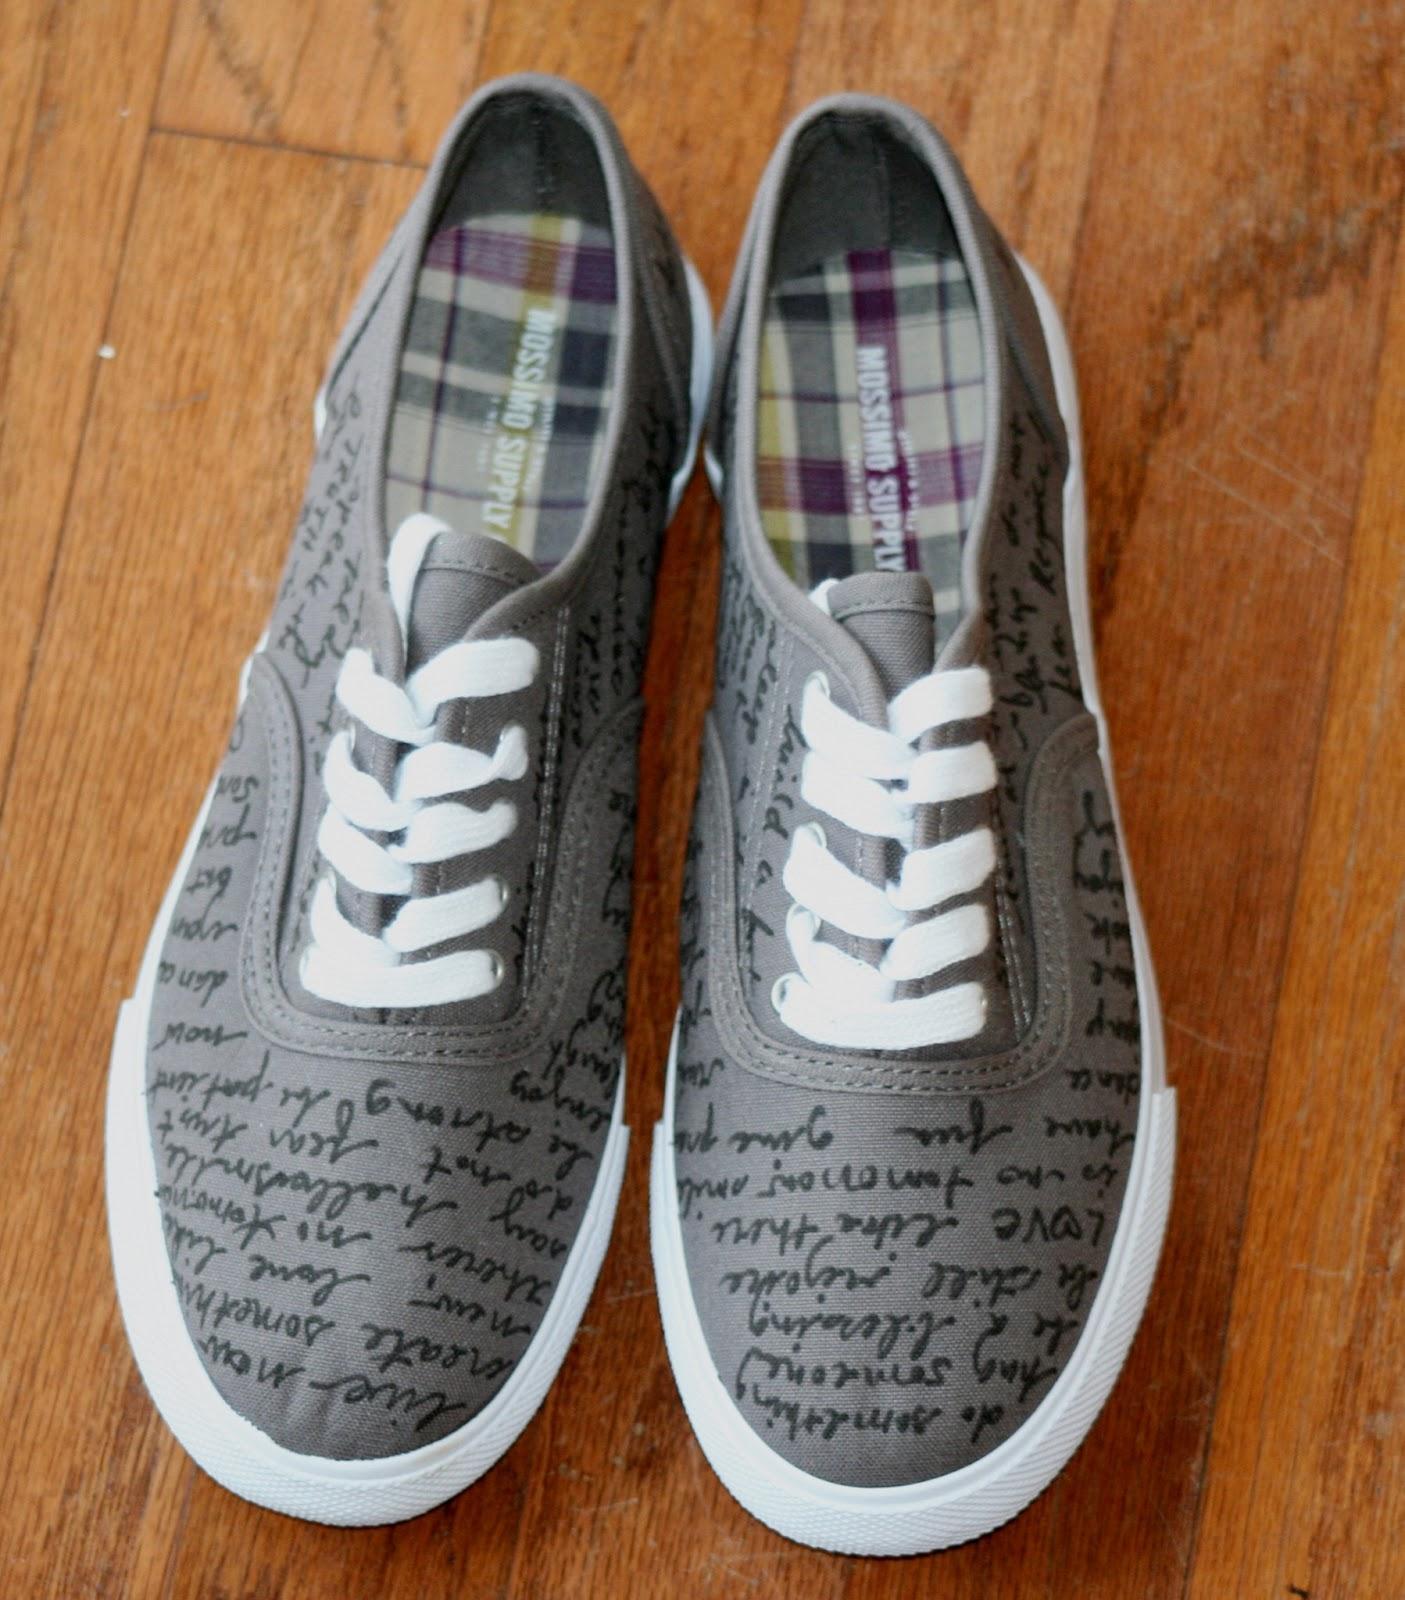 Circles of sunshine re style diy shoe fun for Diy shoes design